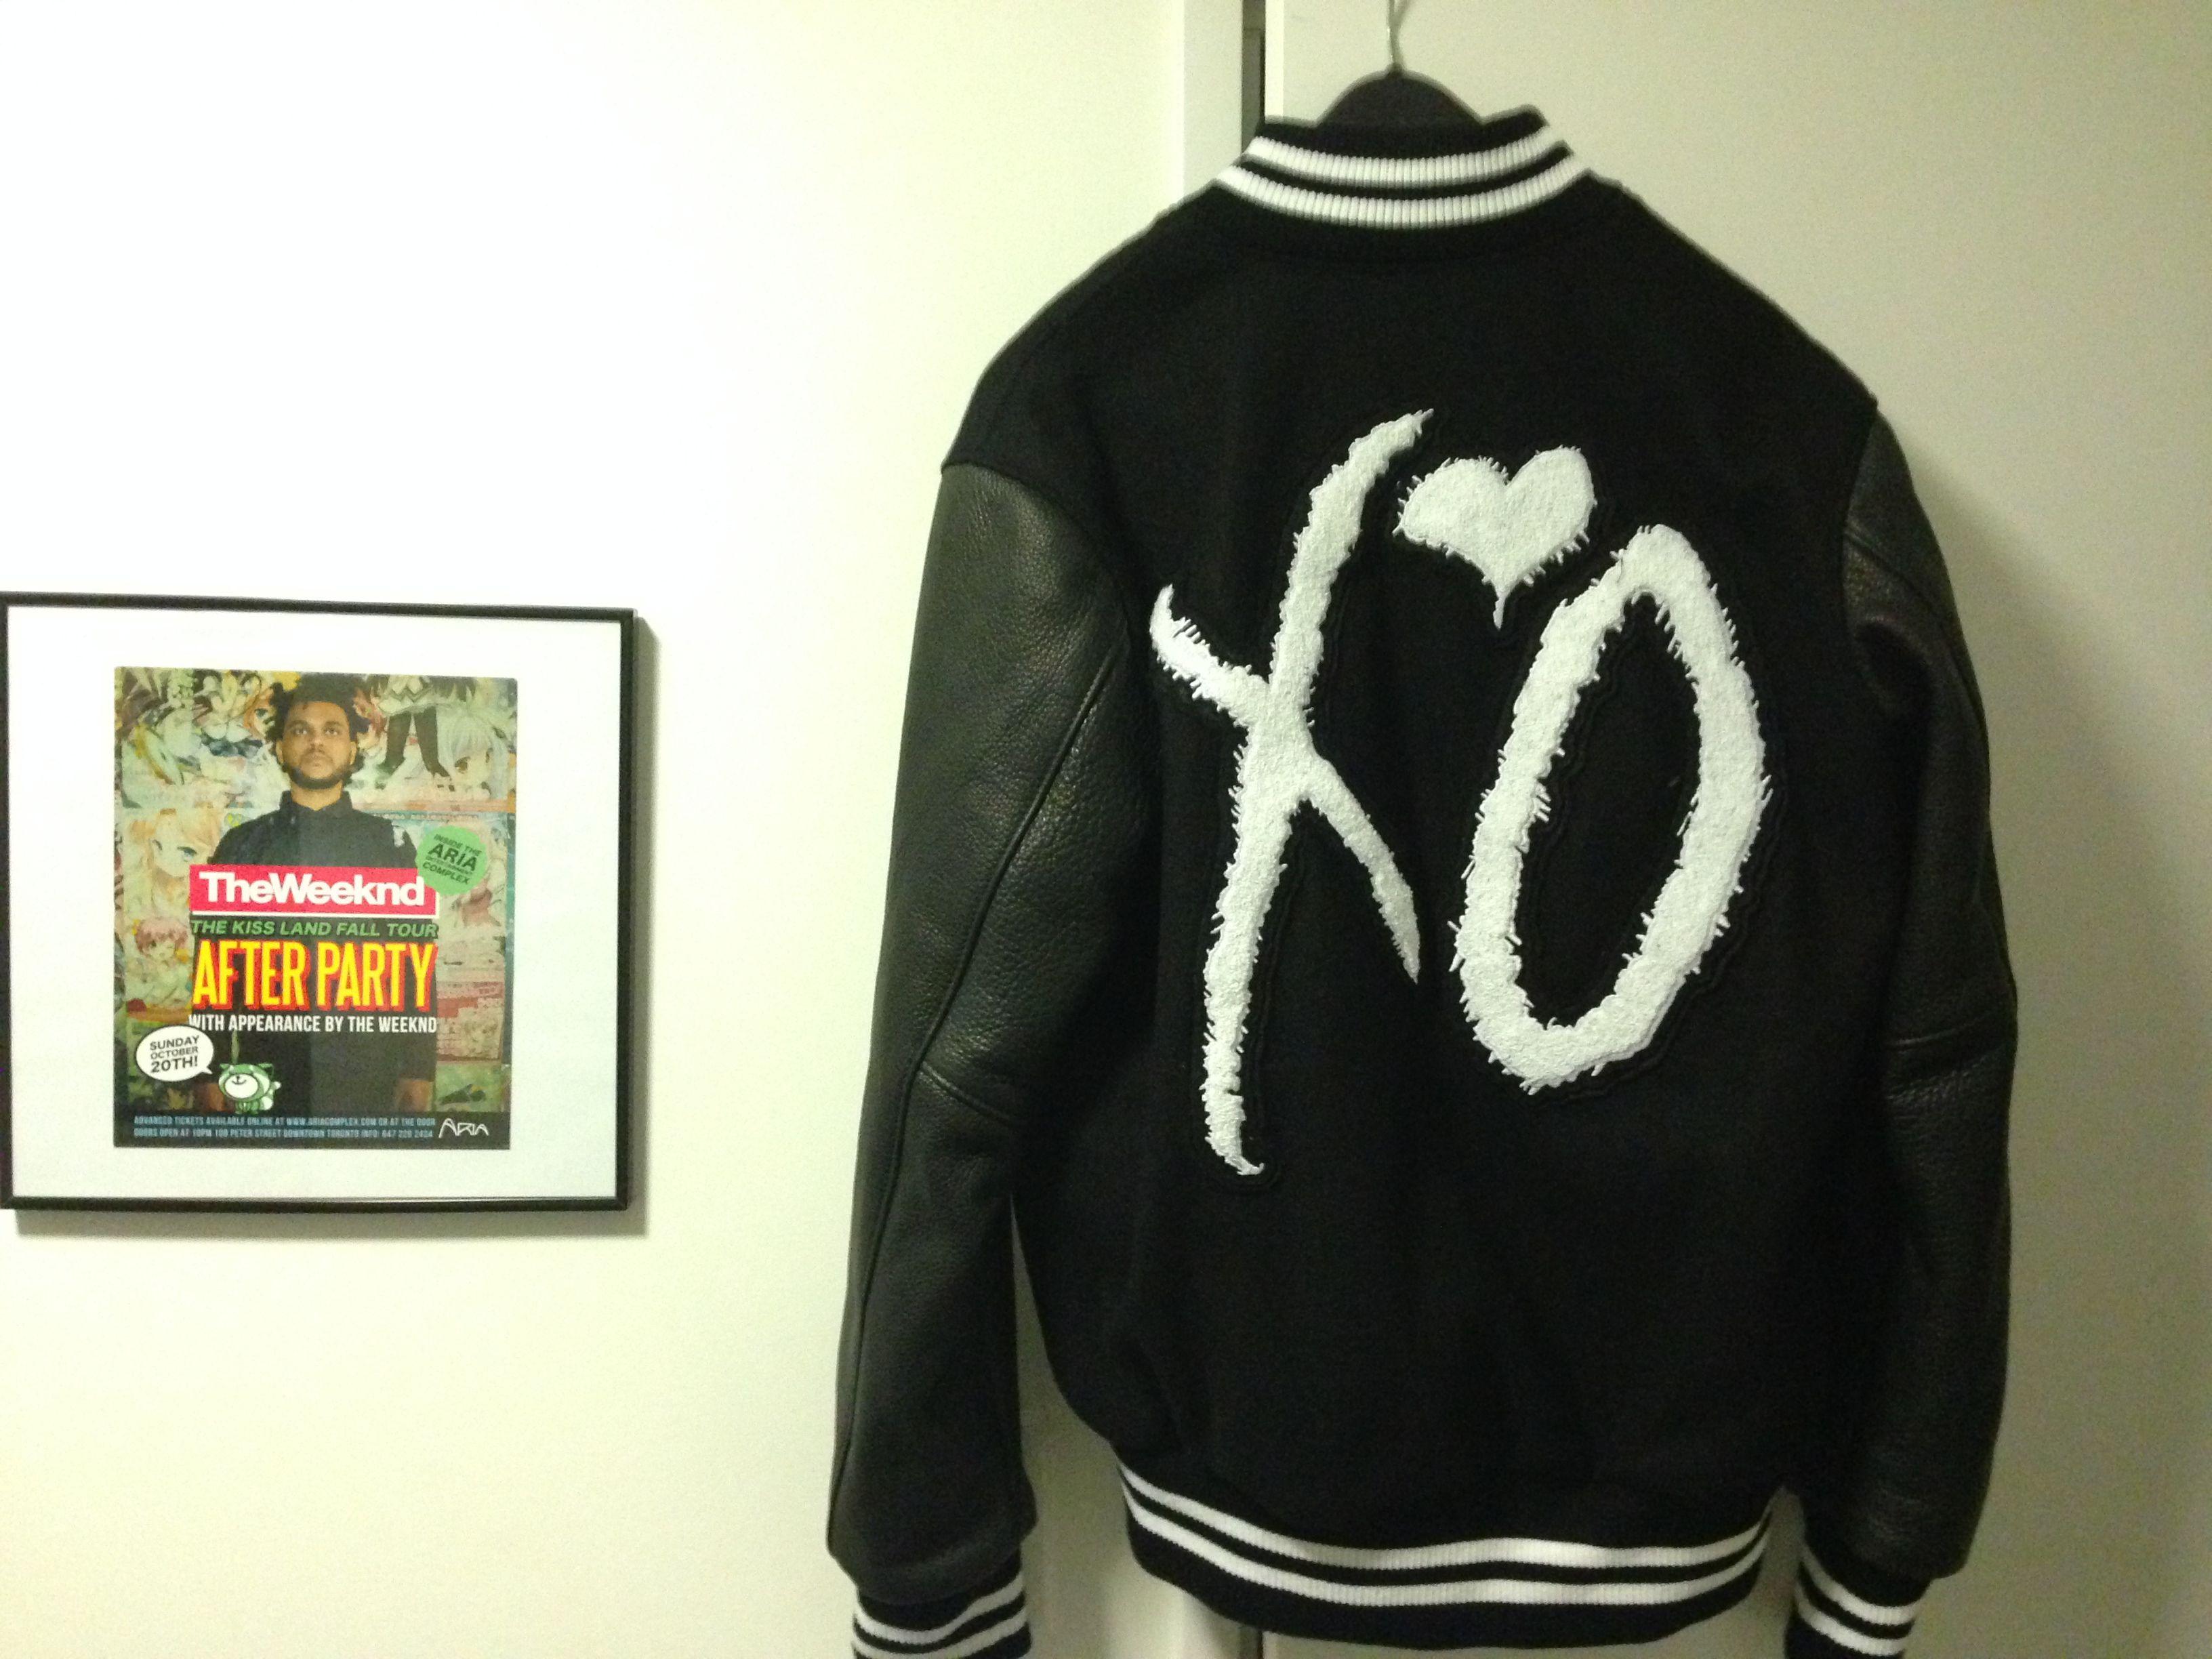 Ridingonlorenzos S Album Ldquo Xo X Roots Varsity Jacket Weeknd Limited Edition 1 Of 30 Rdquo Mdash Photo 5 Of 7 Xo Jacket Varsity Jacket Jackets [ 2448 x 3264 Pixel ]